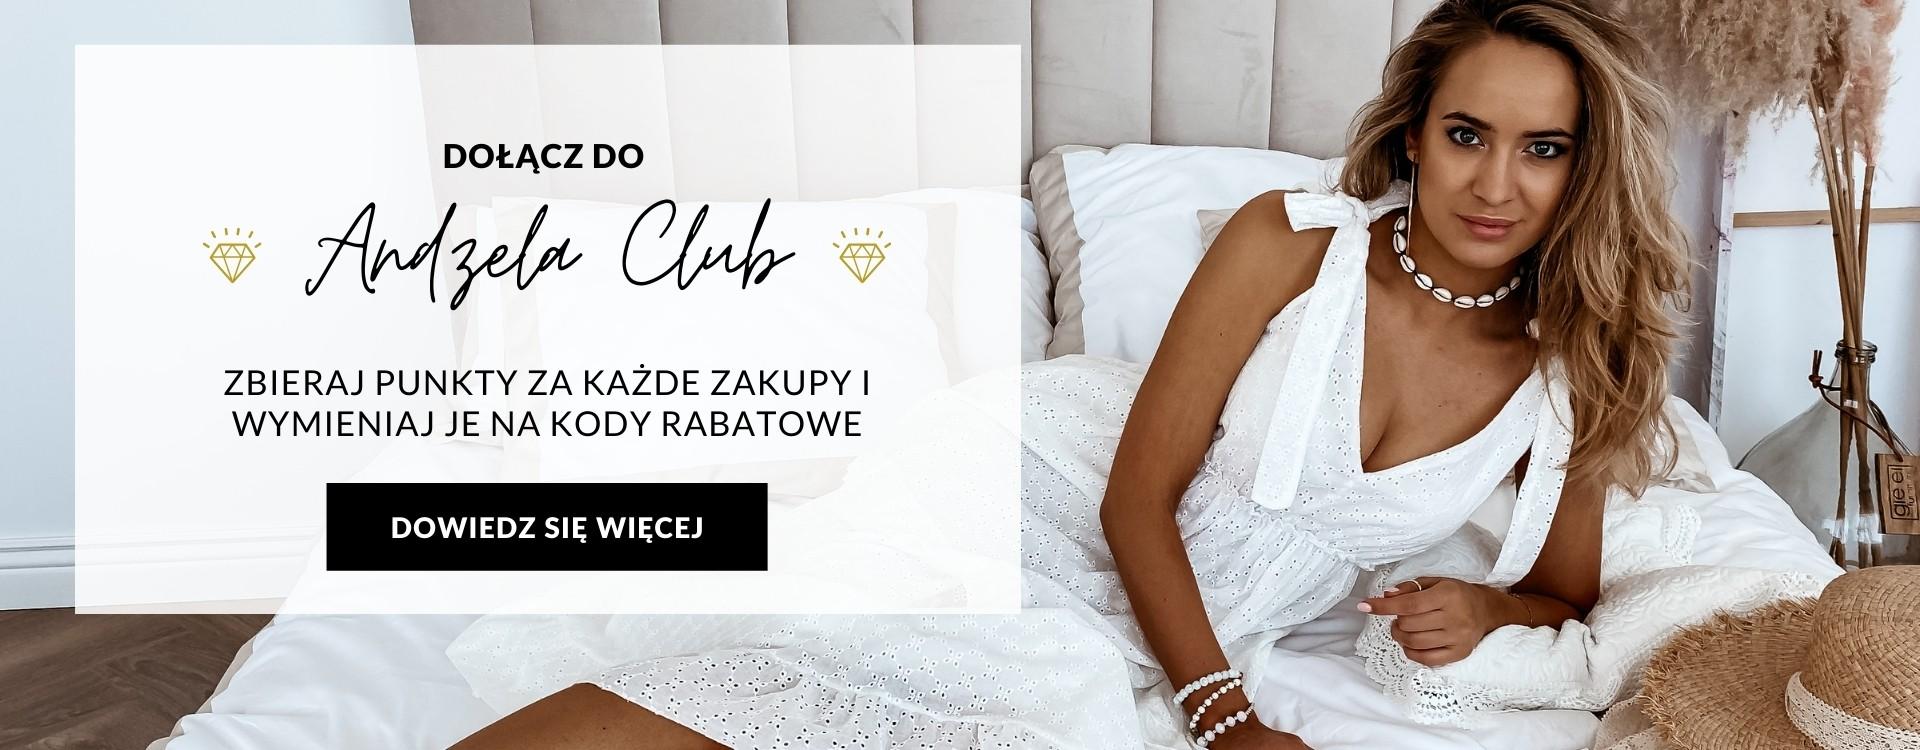 Andzela Club